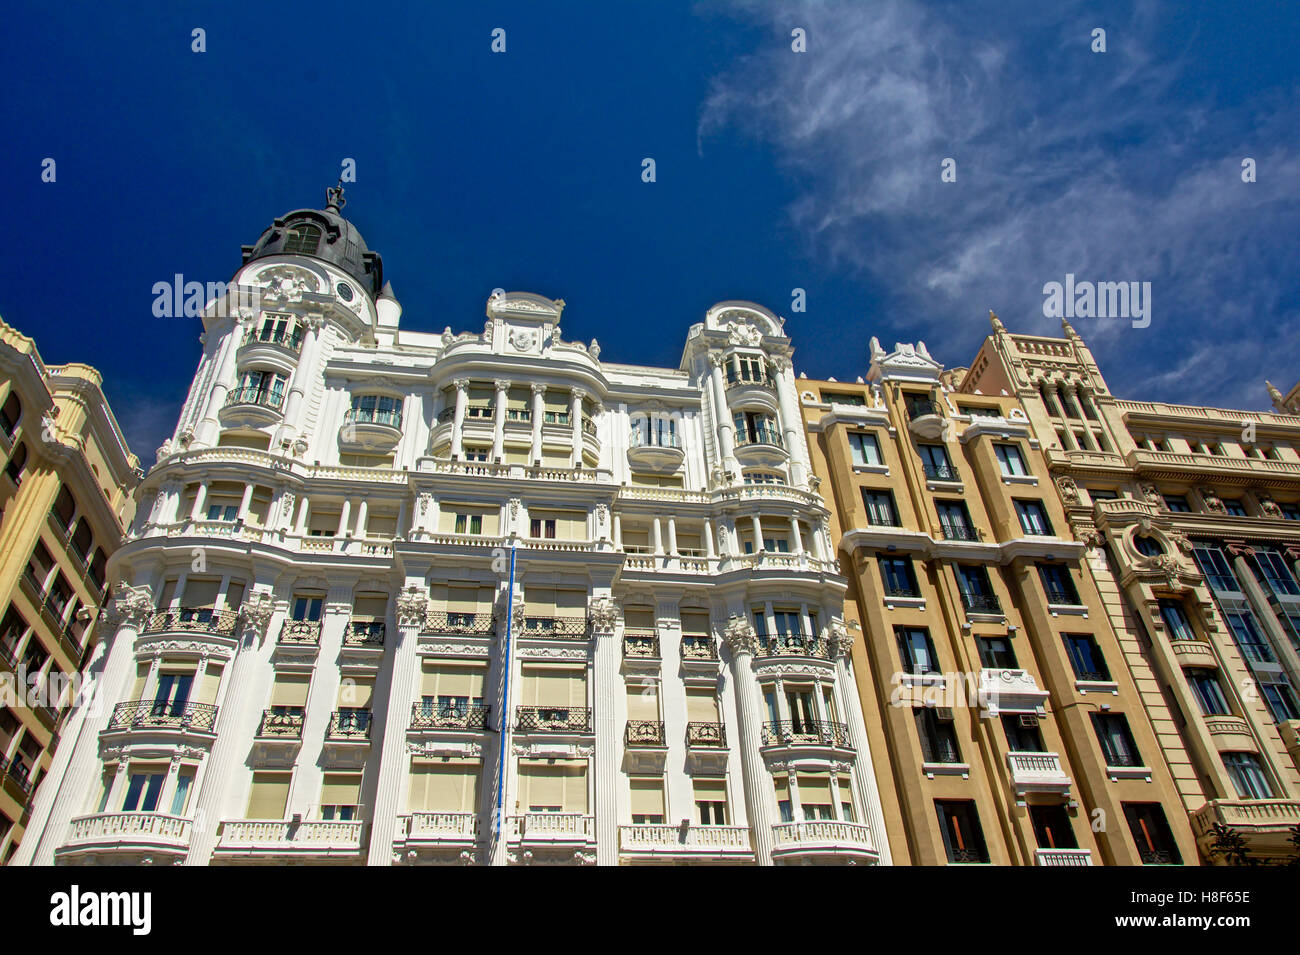 Fassade des berühmten Hotel im neoklassizistischen Stil an der Gran Via in Madrid, Spanien Stockbild